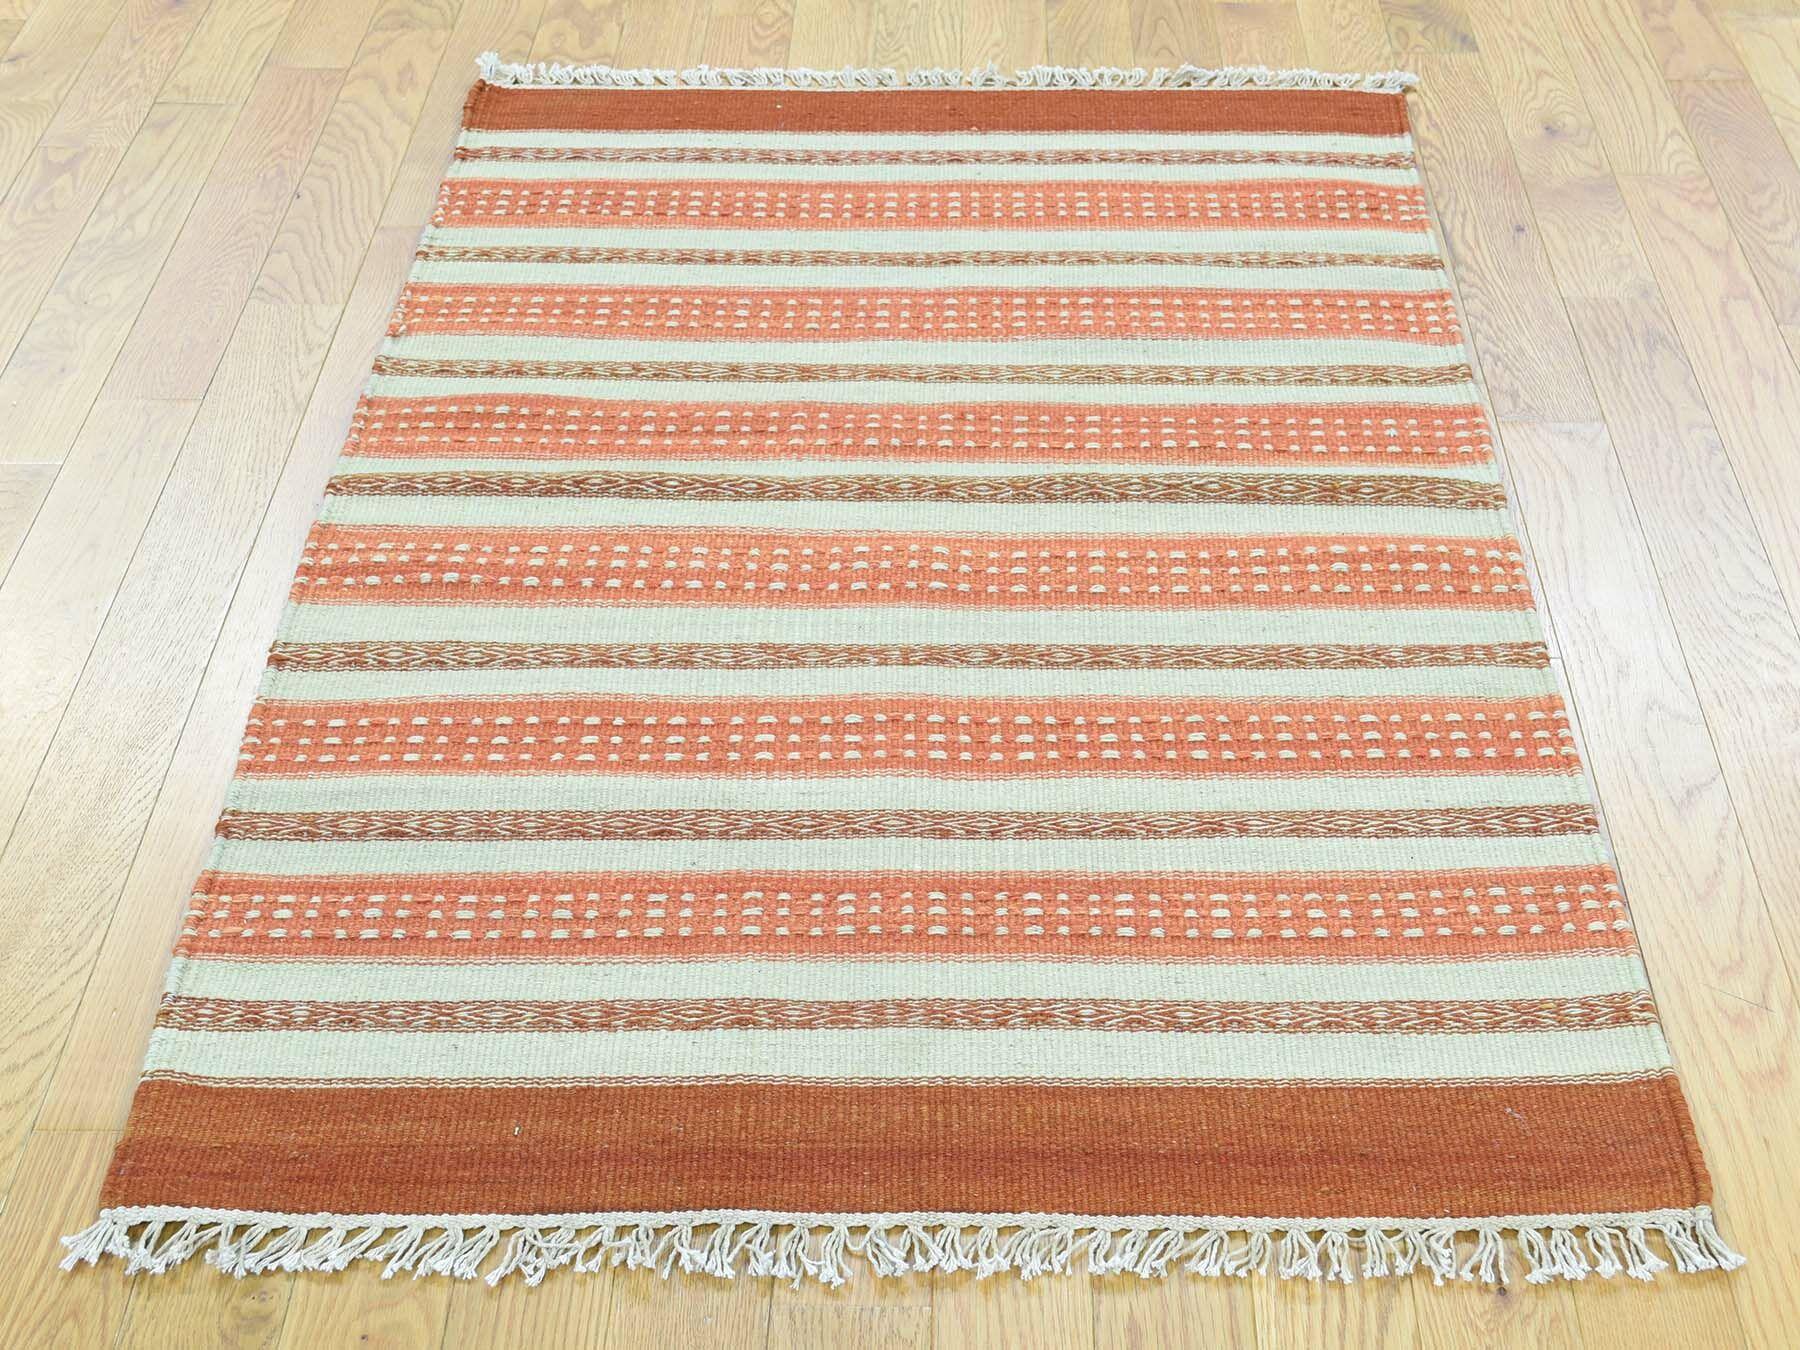 One-of-a-Kind Bedford Striped Reversible Handmade Kilim Wool Area Rug